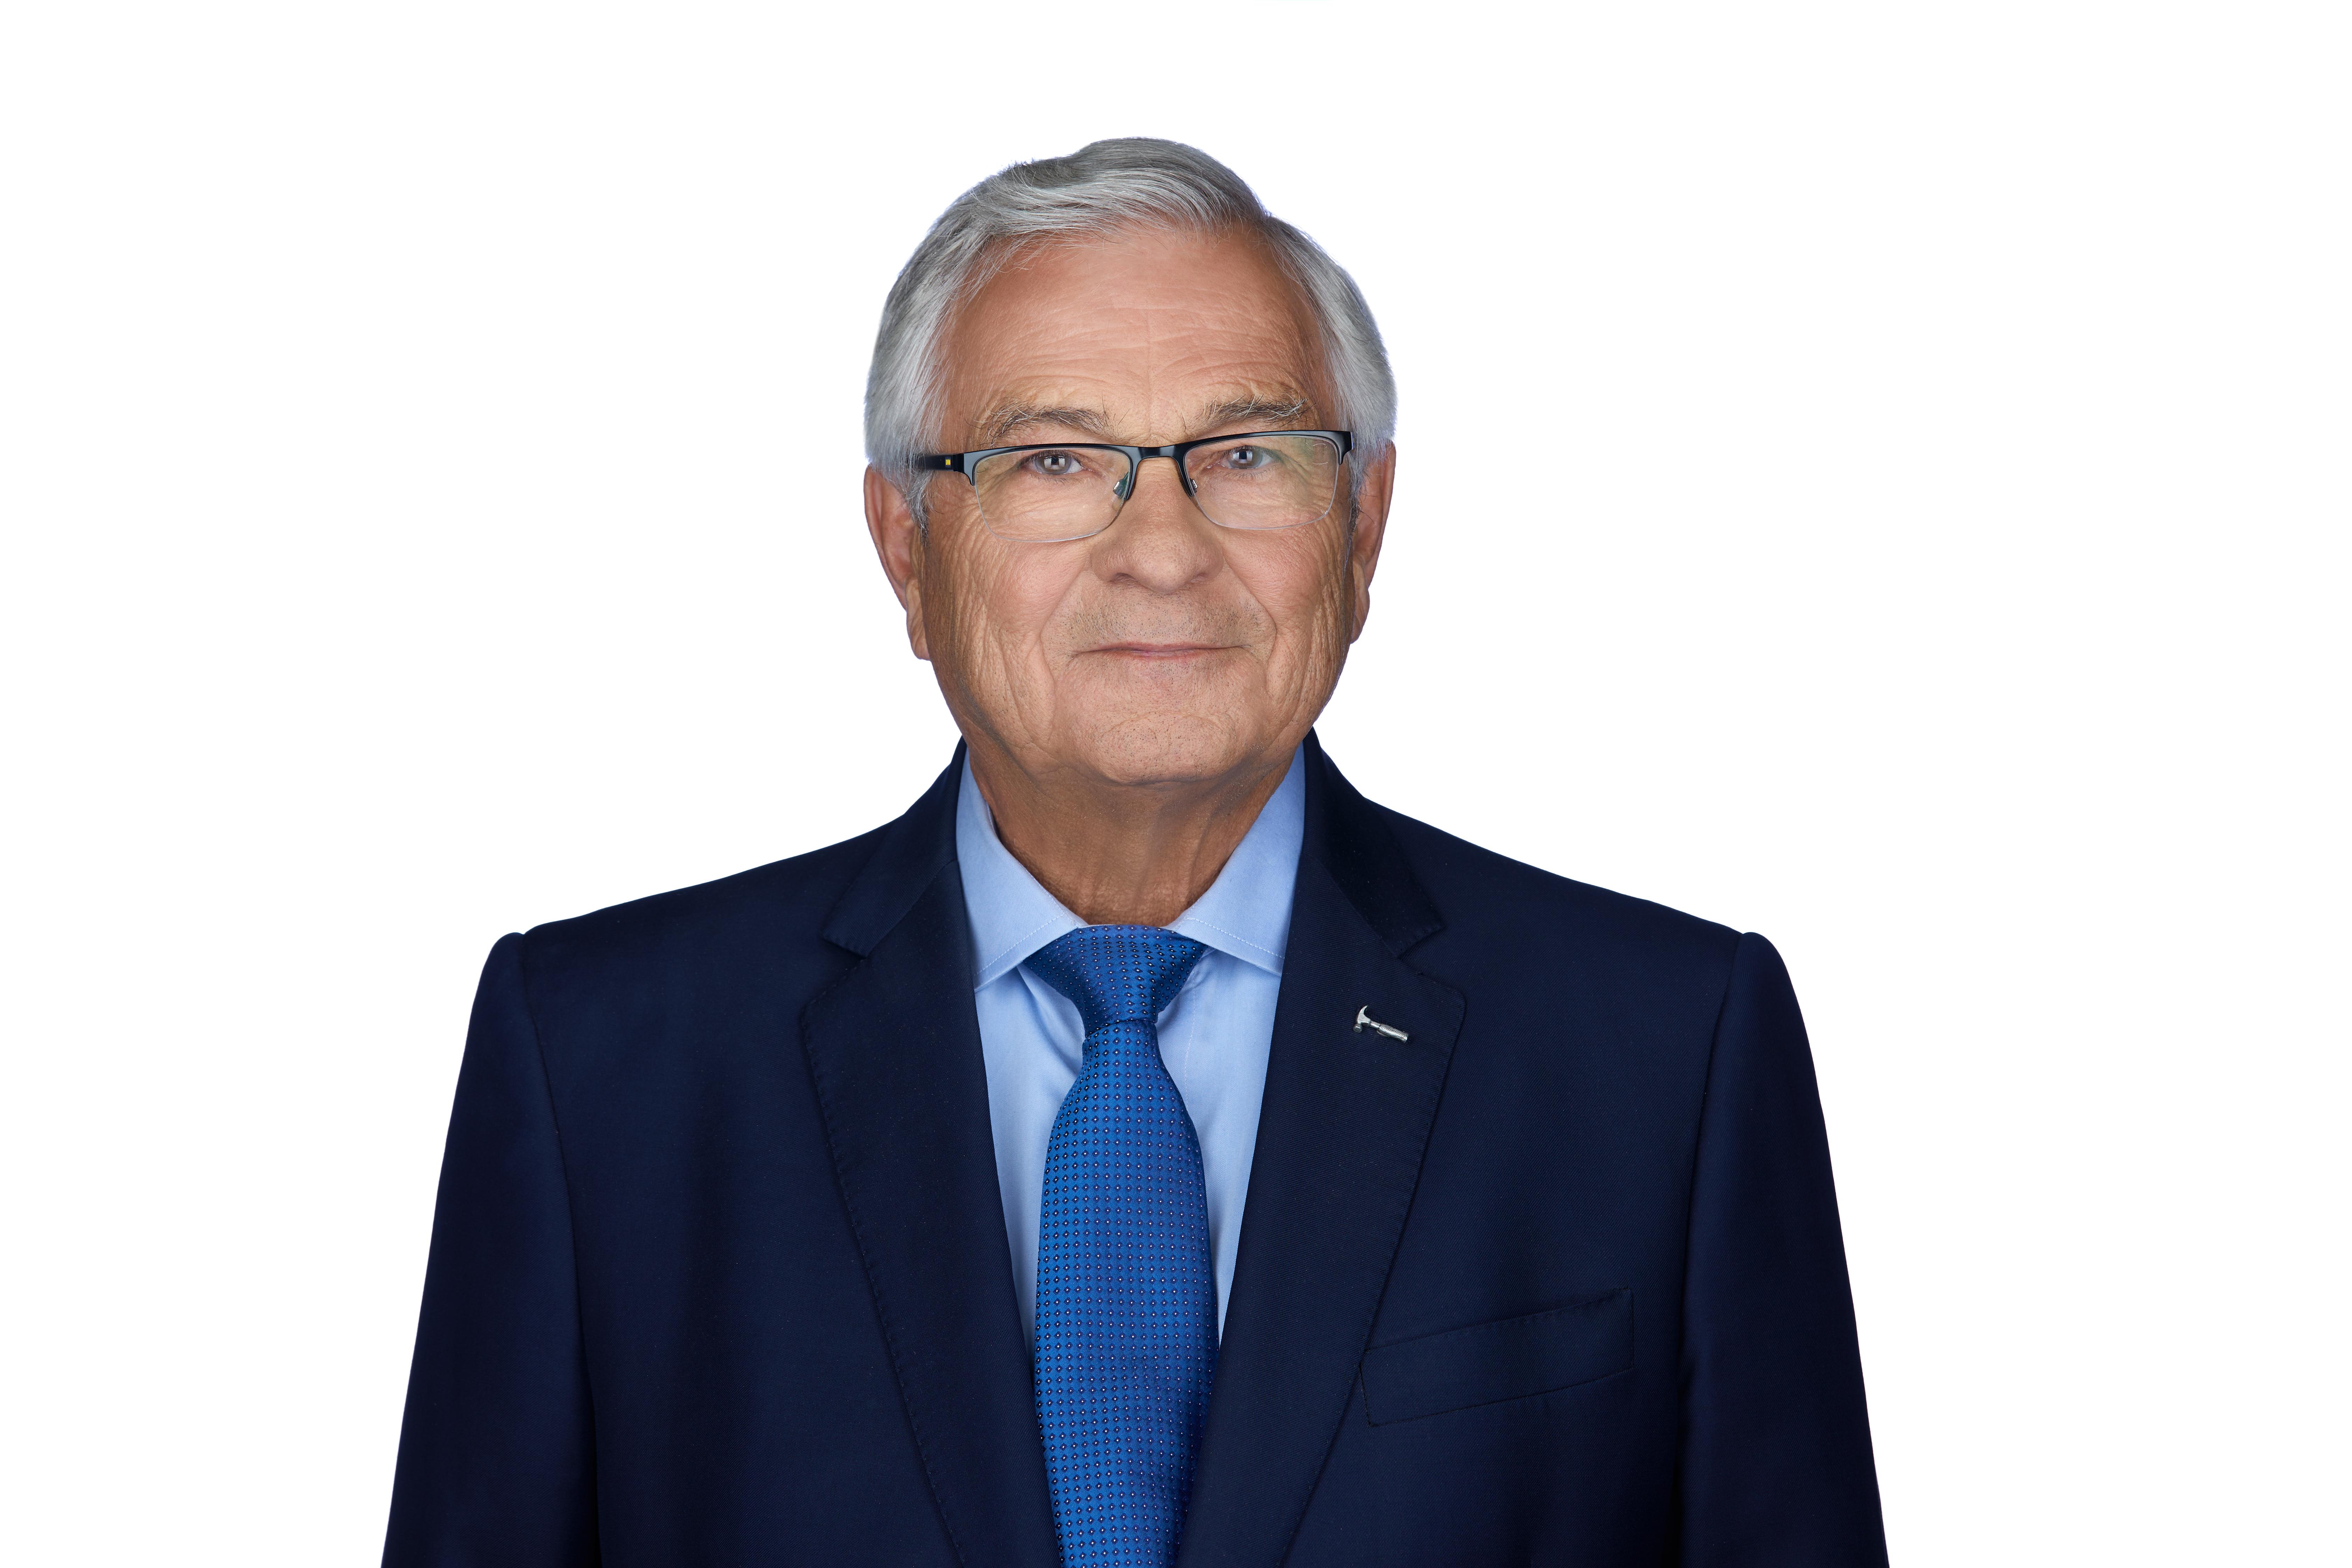 Don Oborowsky